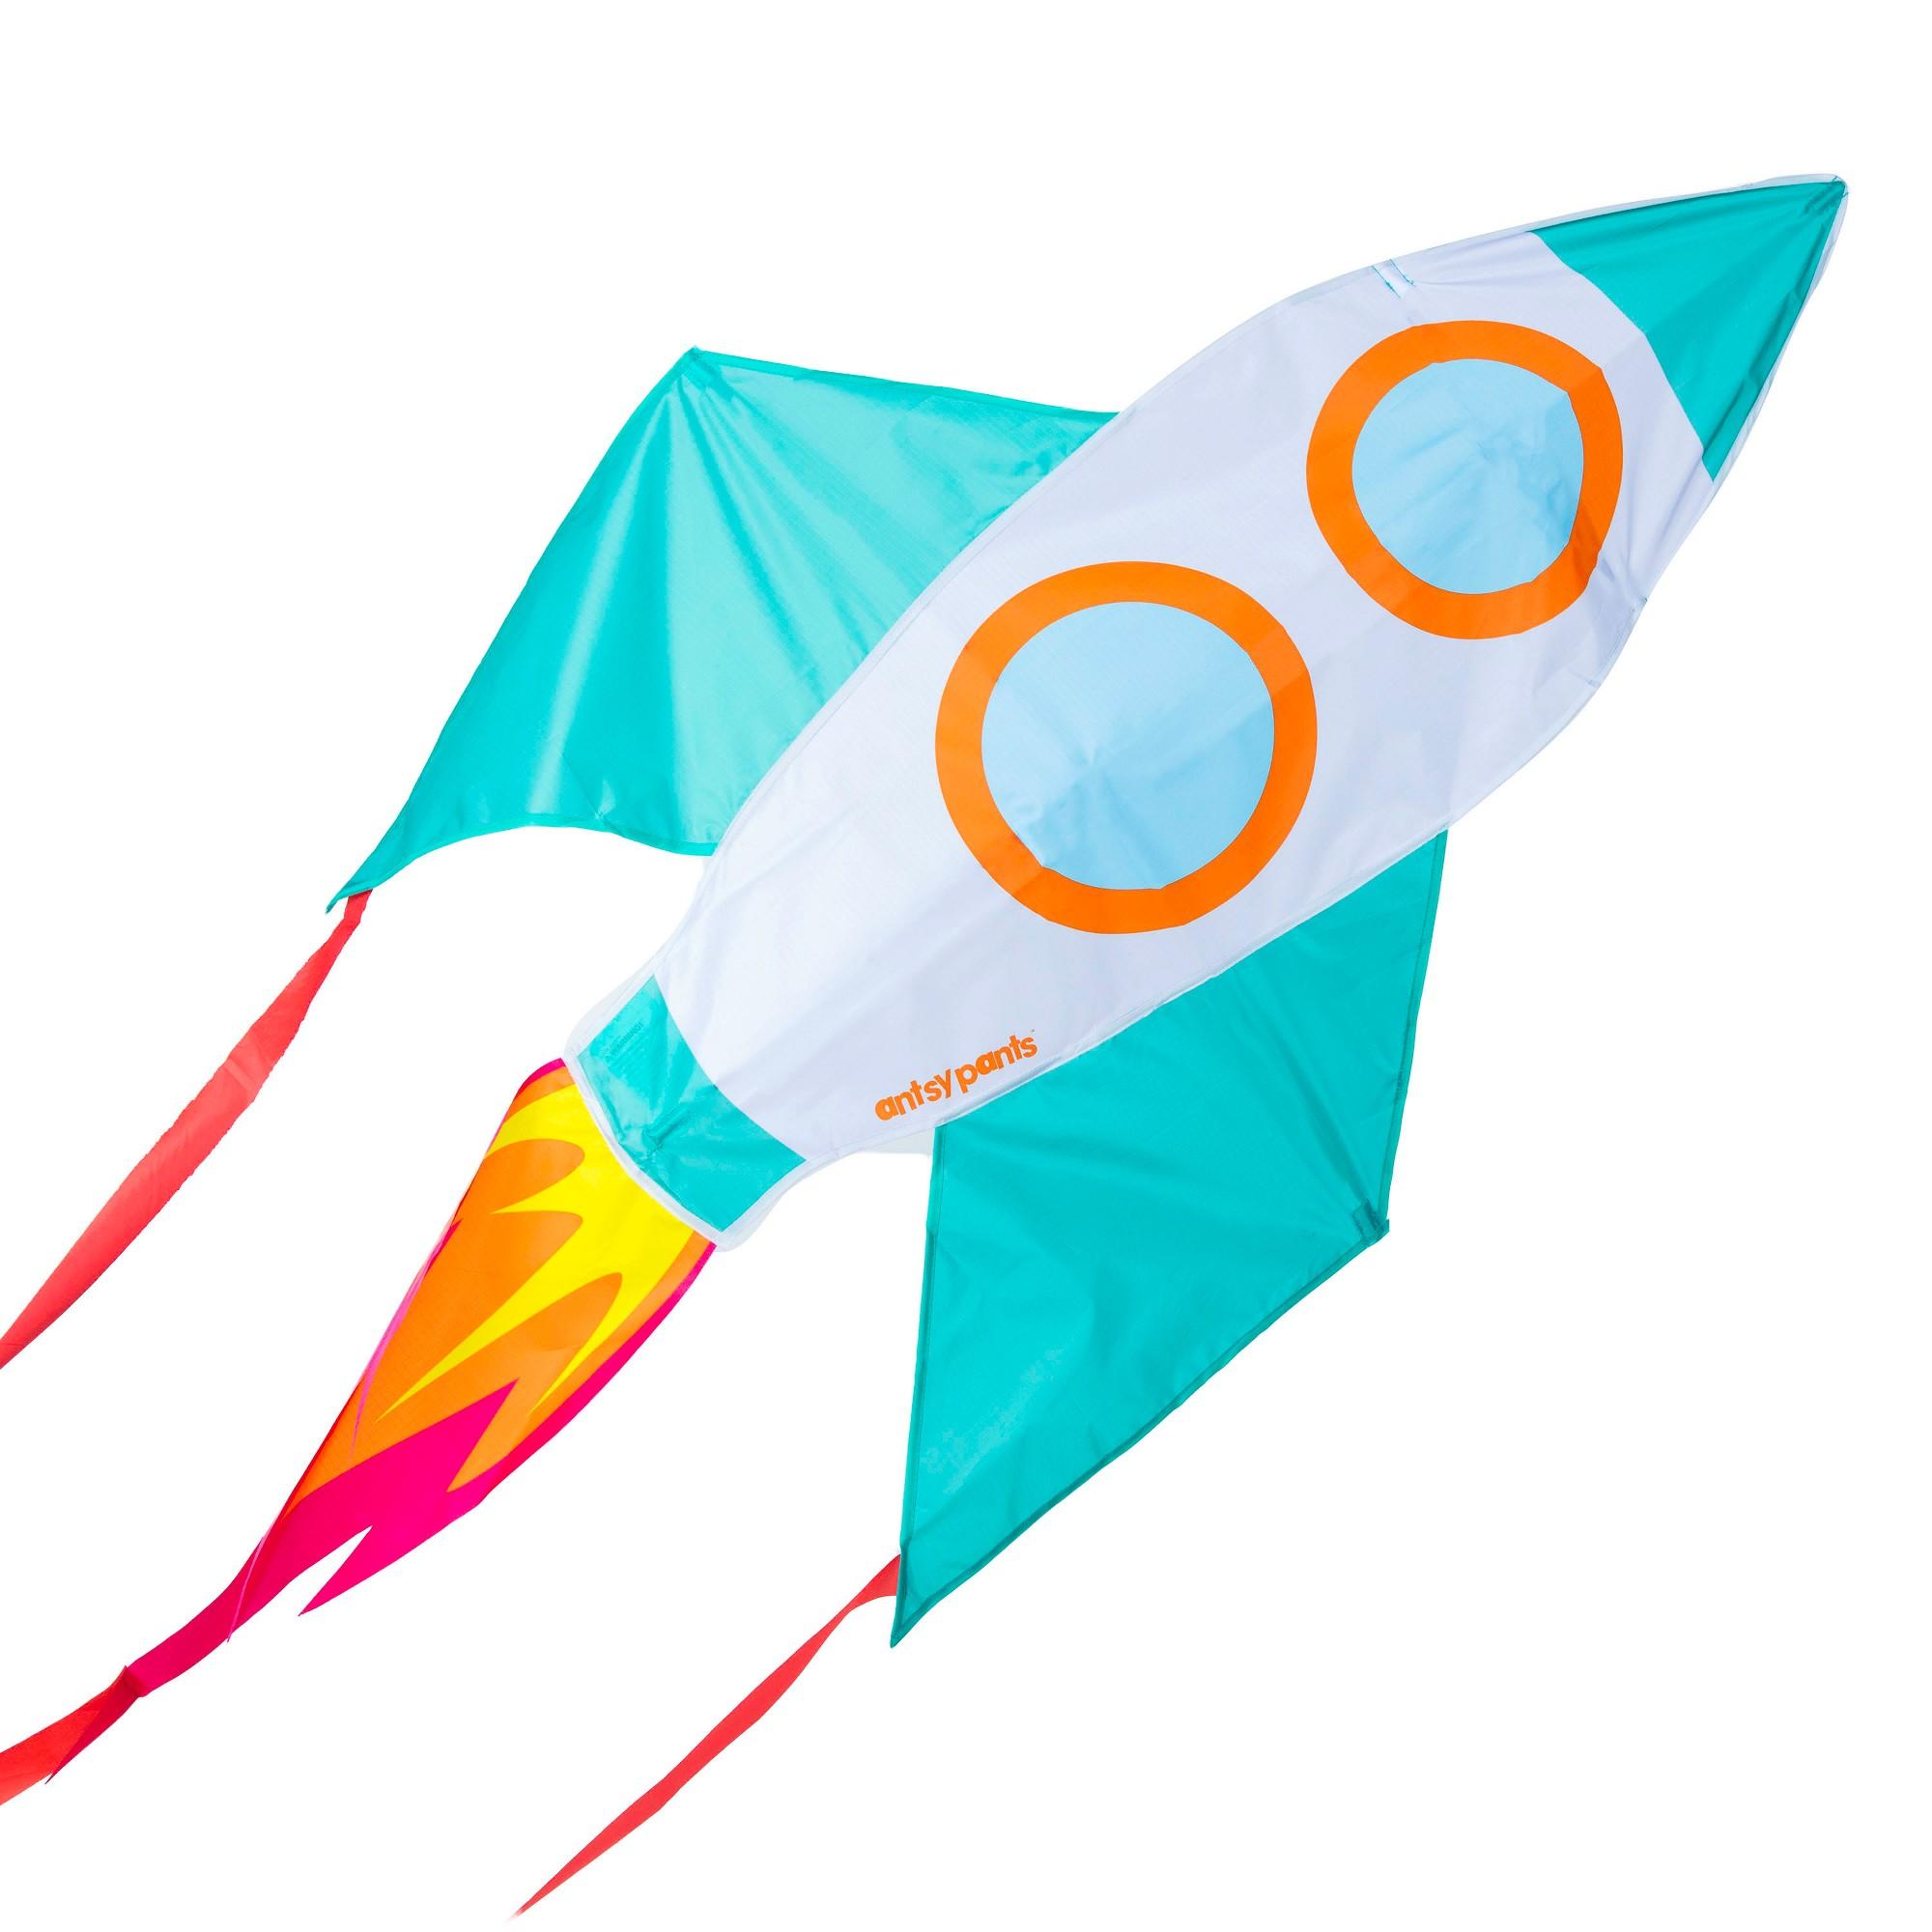 Kite Boys Rocket Jumper Organic 0-5 Years